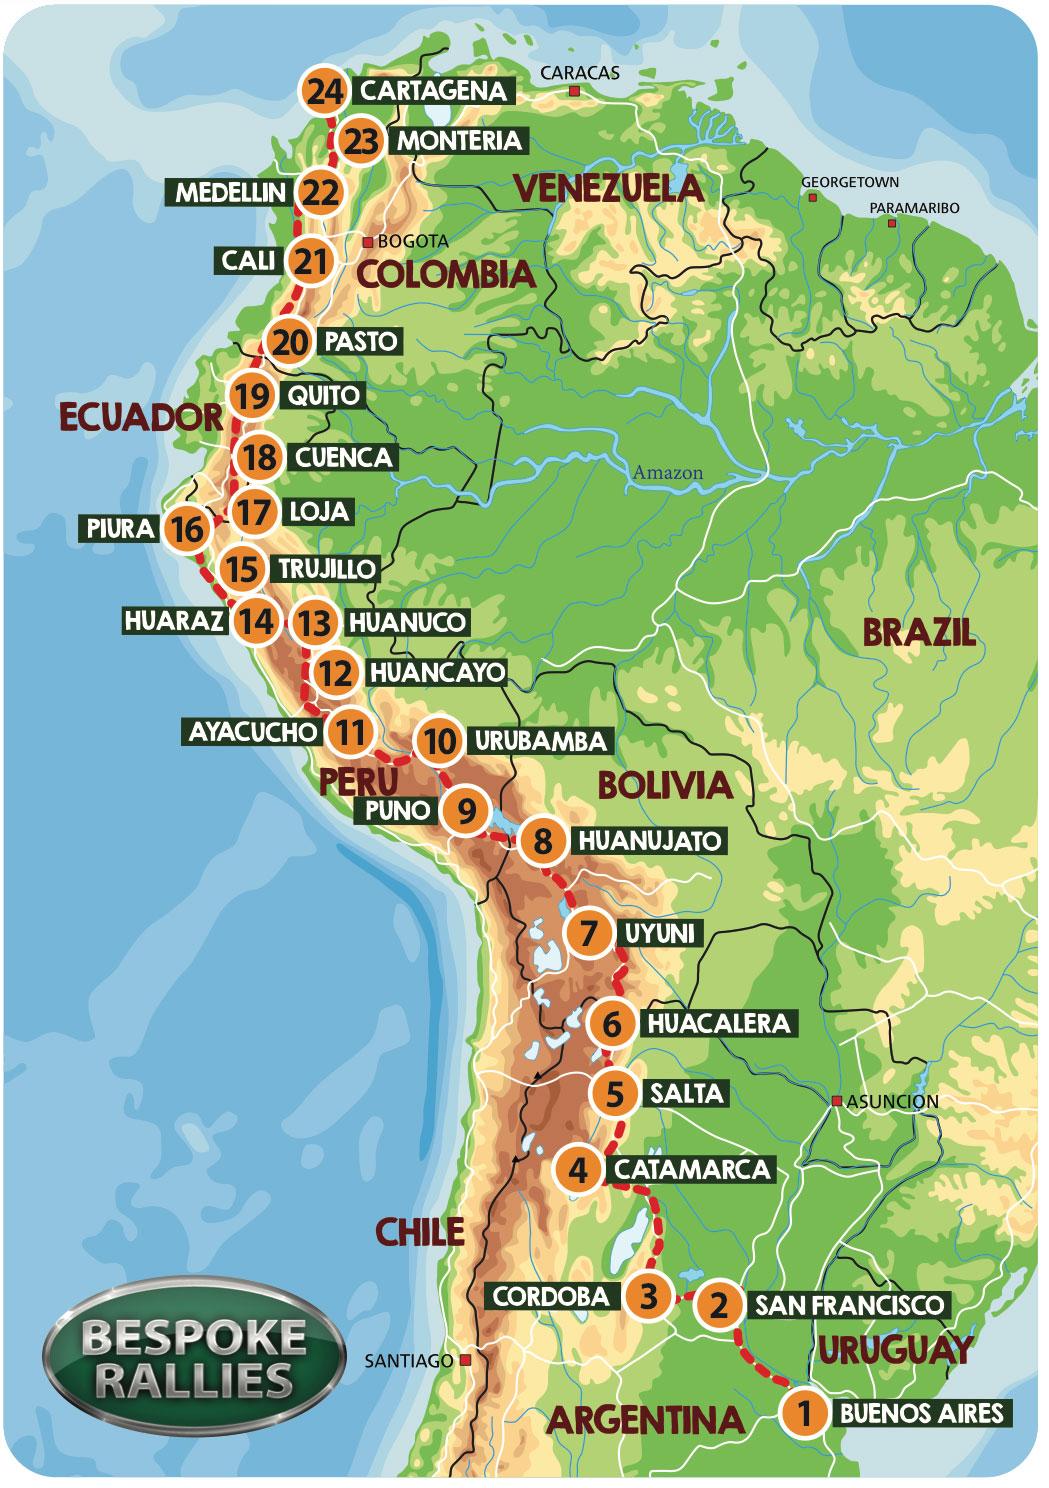 Rally Live: Bespoke Rallies | Grand Prix of South America | Classic Car Rally